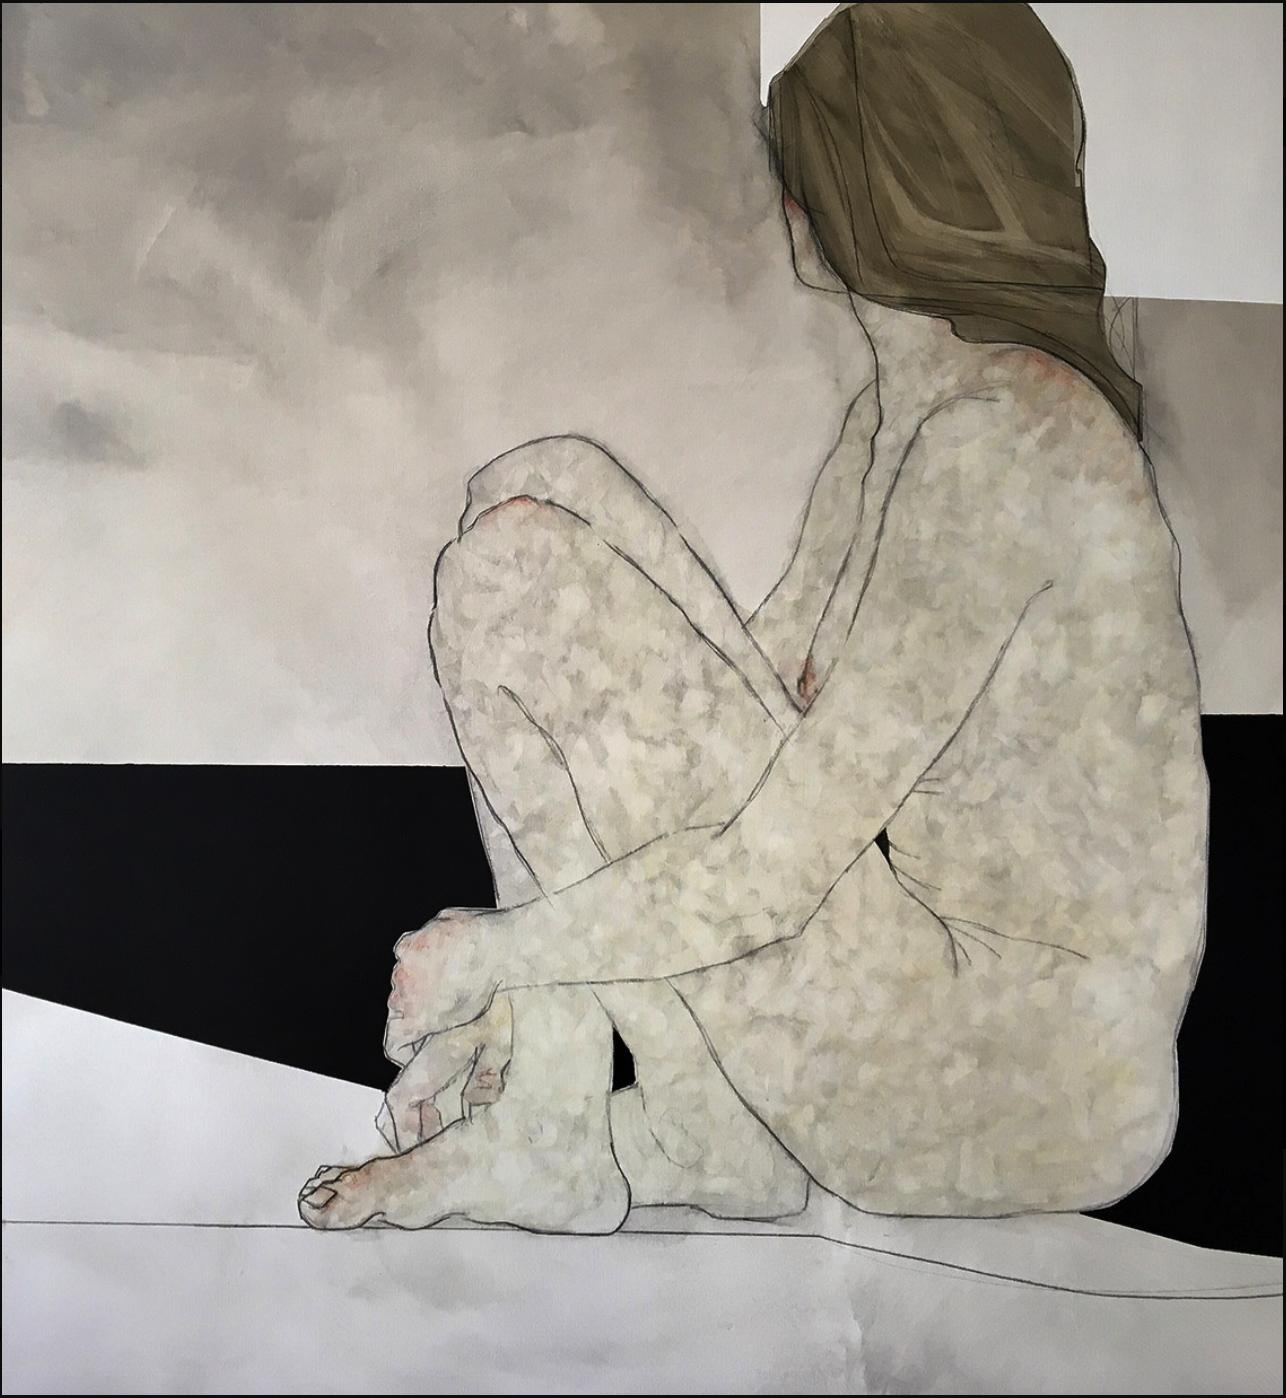 ISOKRATIA artwork by Nikoleta Sekulovic